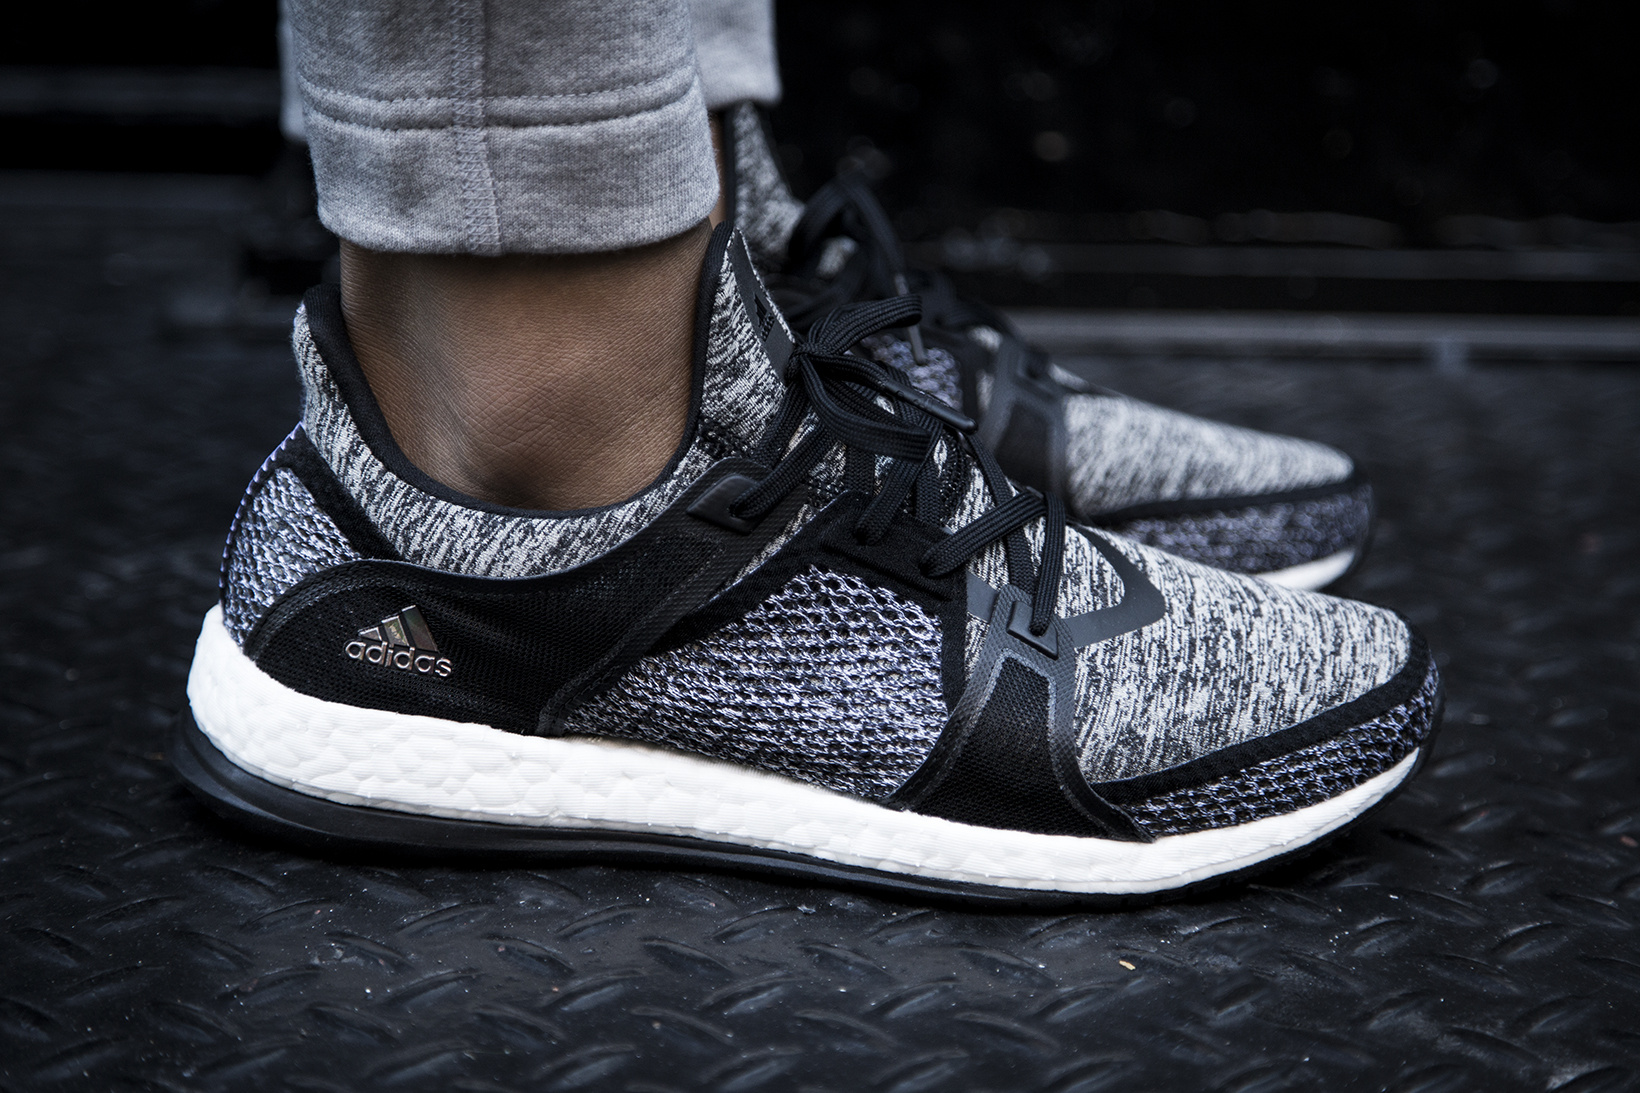 reigning-champ-adidas-pureboost-closer-look-3.jpg